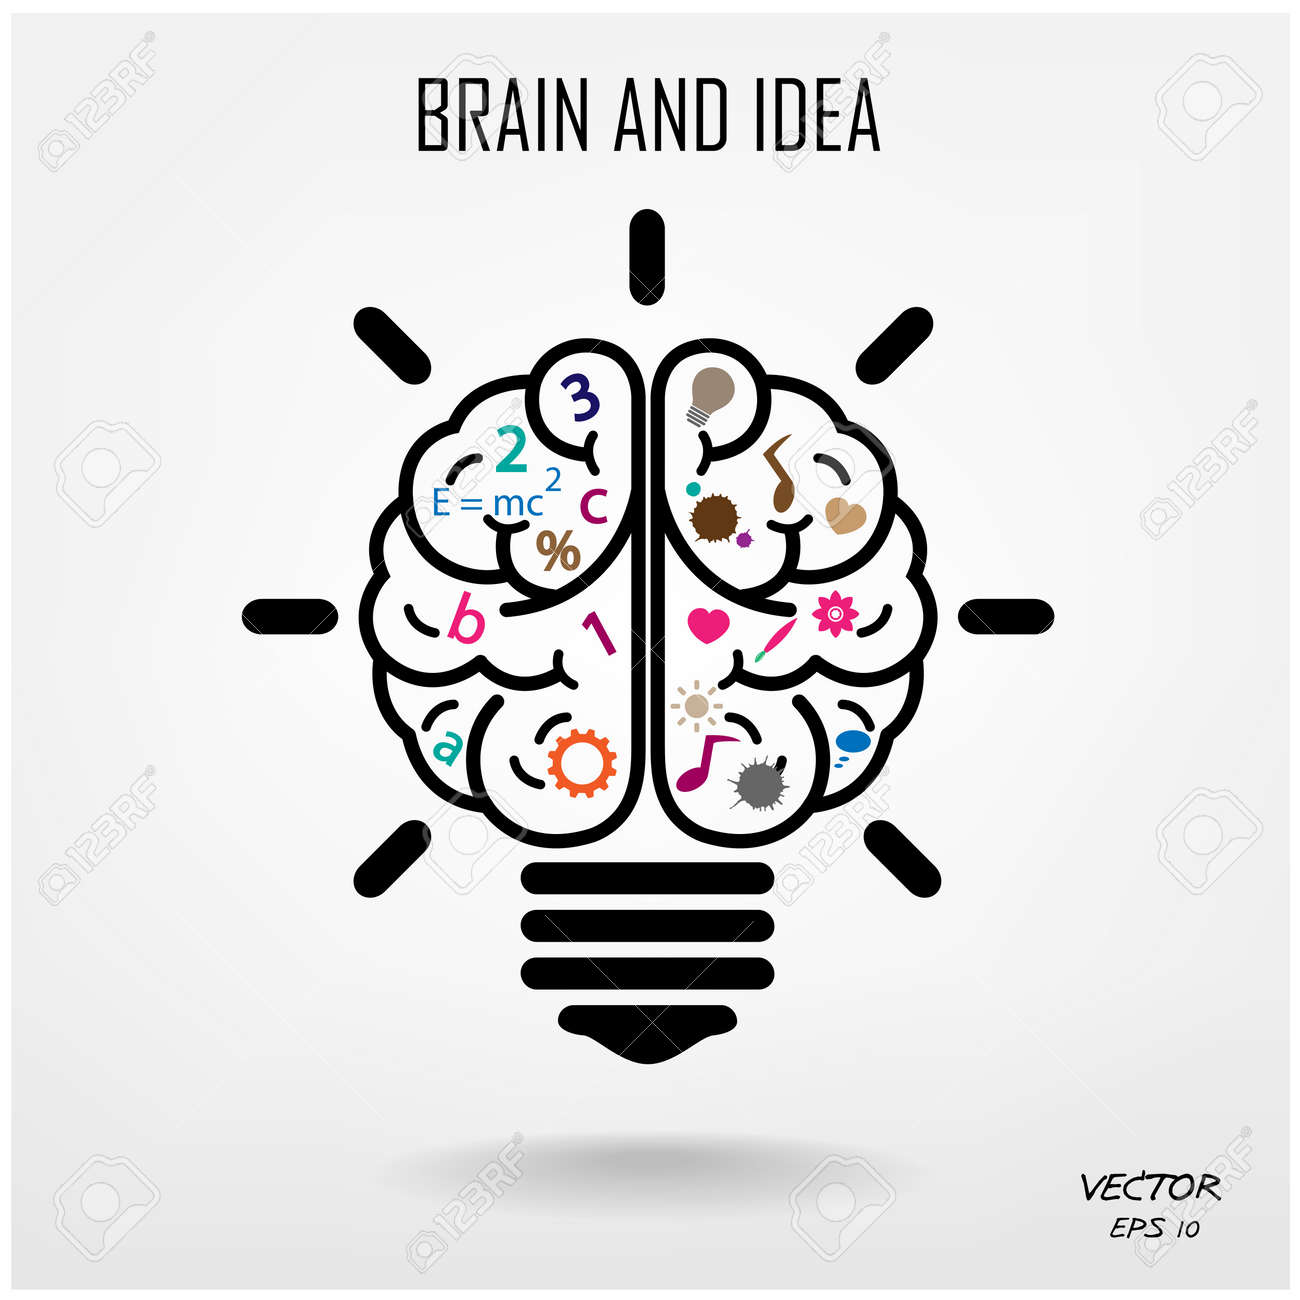 Creative brain Idea concept background design Stock Vector - 25249086